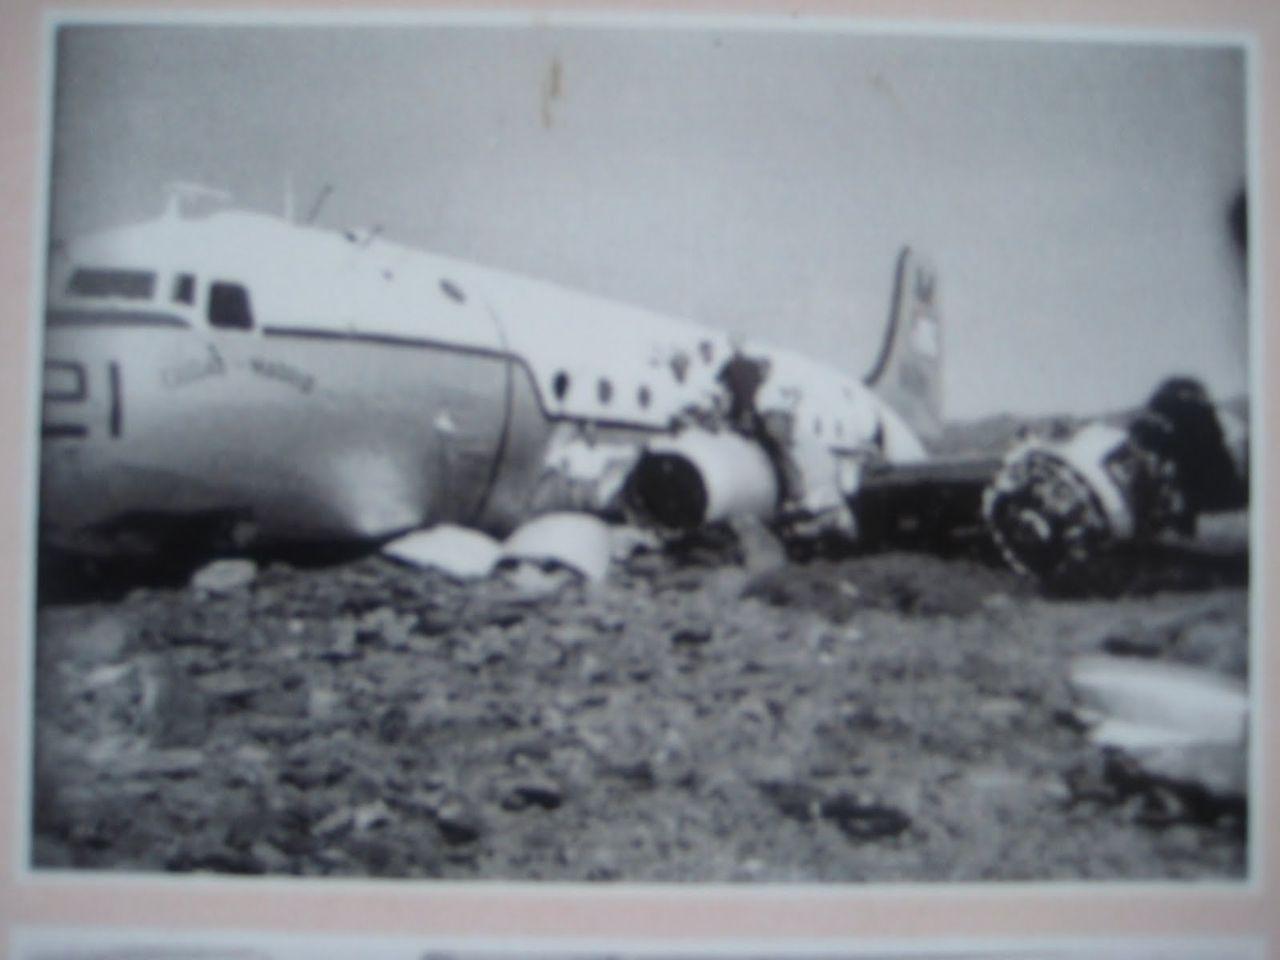 el avion de jeres del marquesado